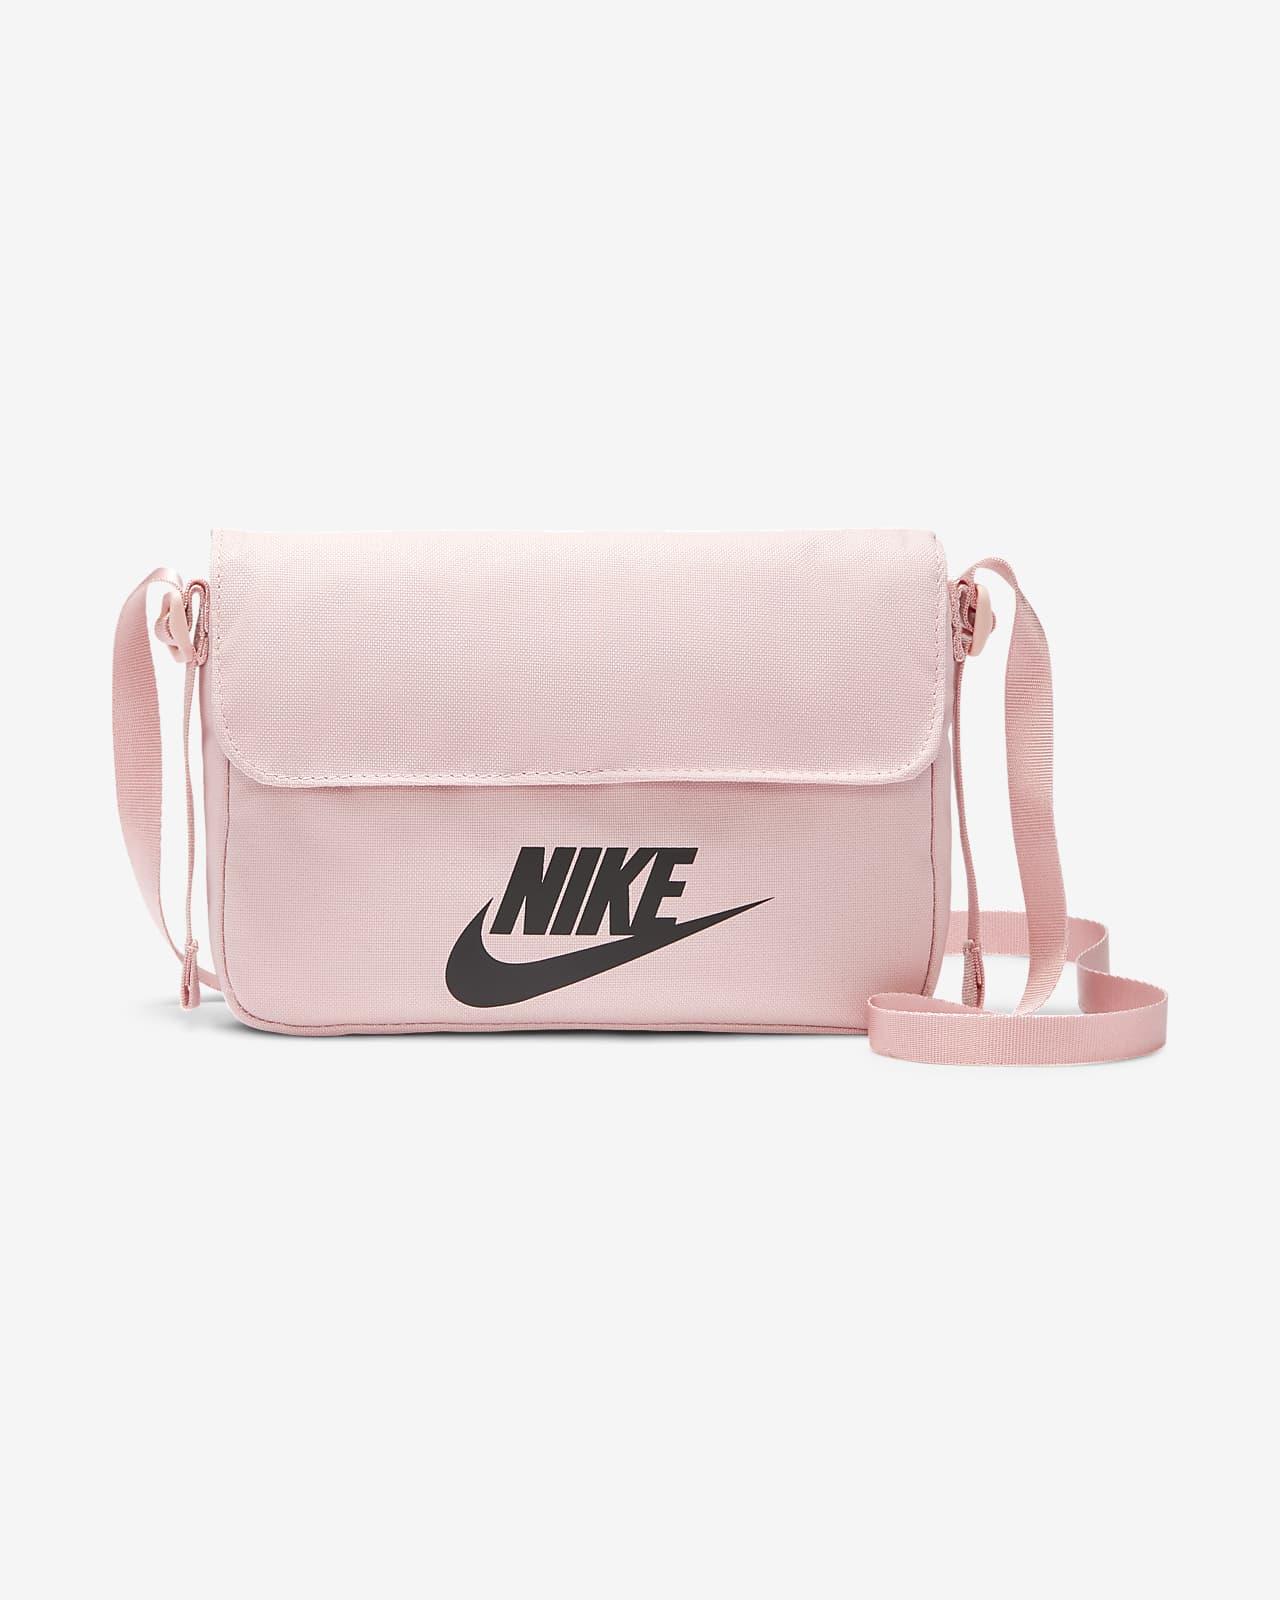 Nike Sportswear Women's Futura 365 Cross-Body Bag